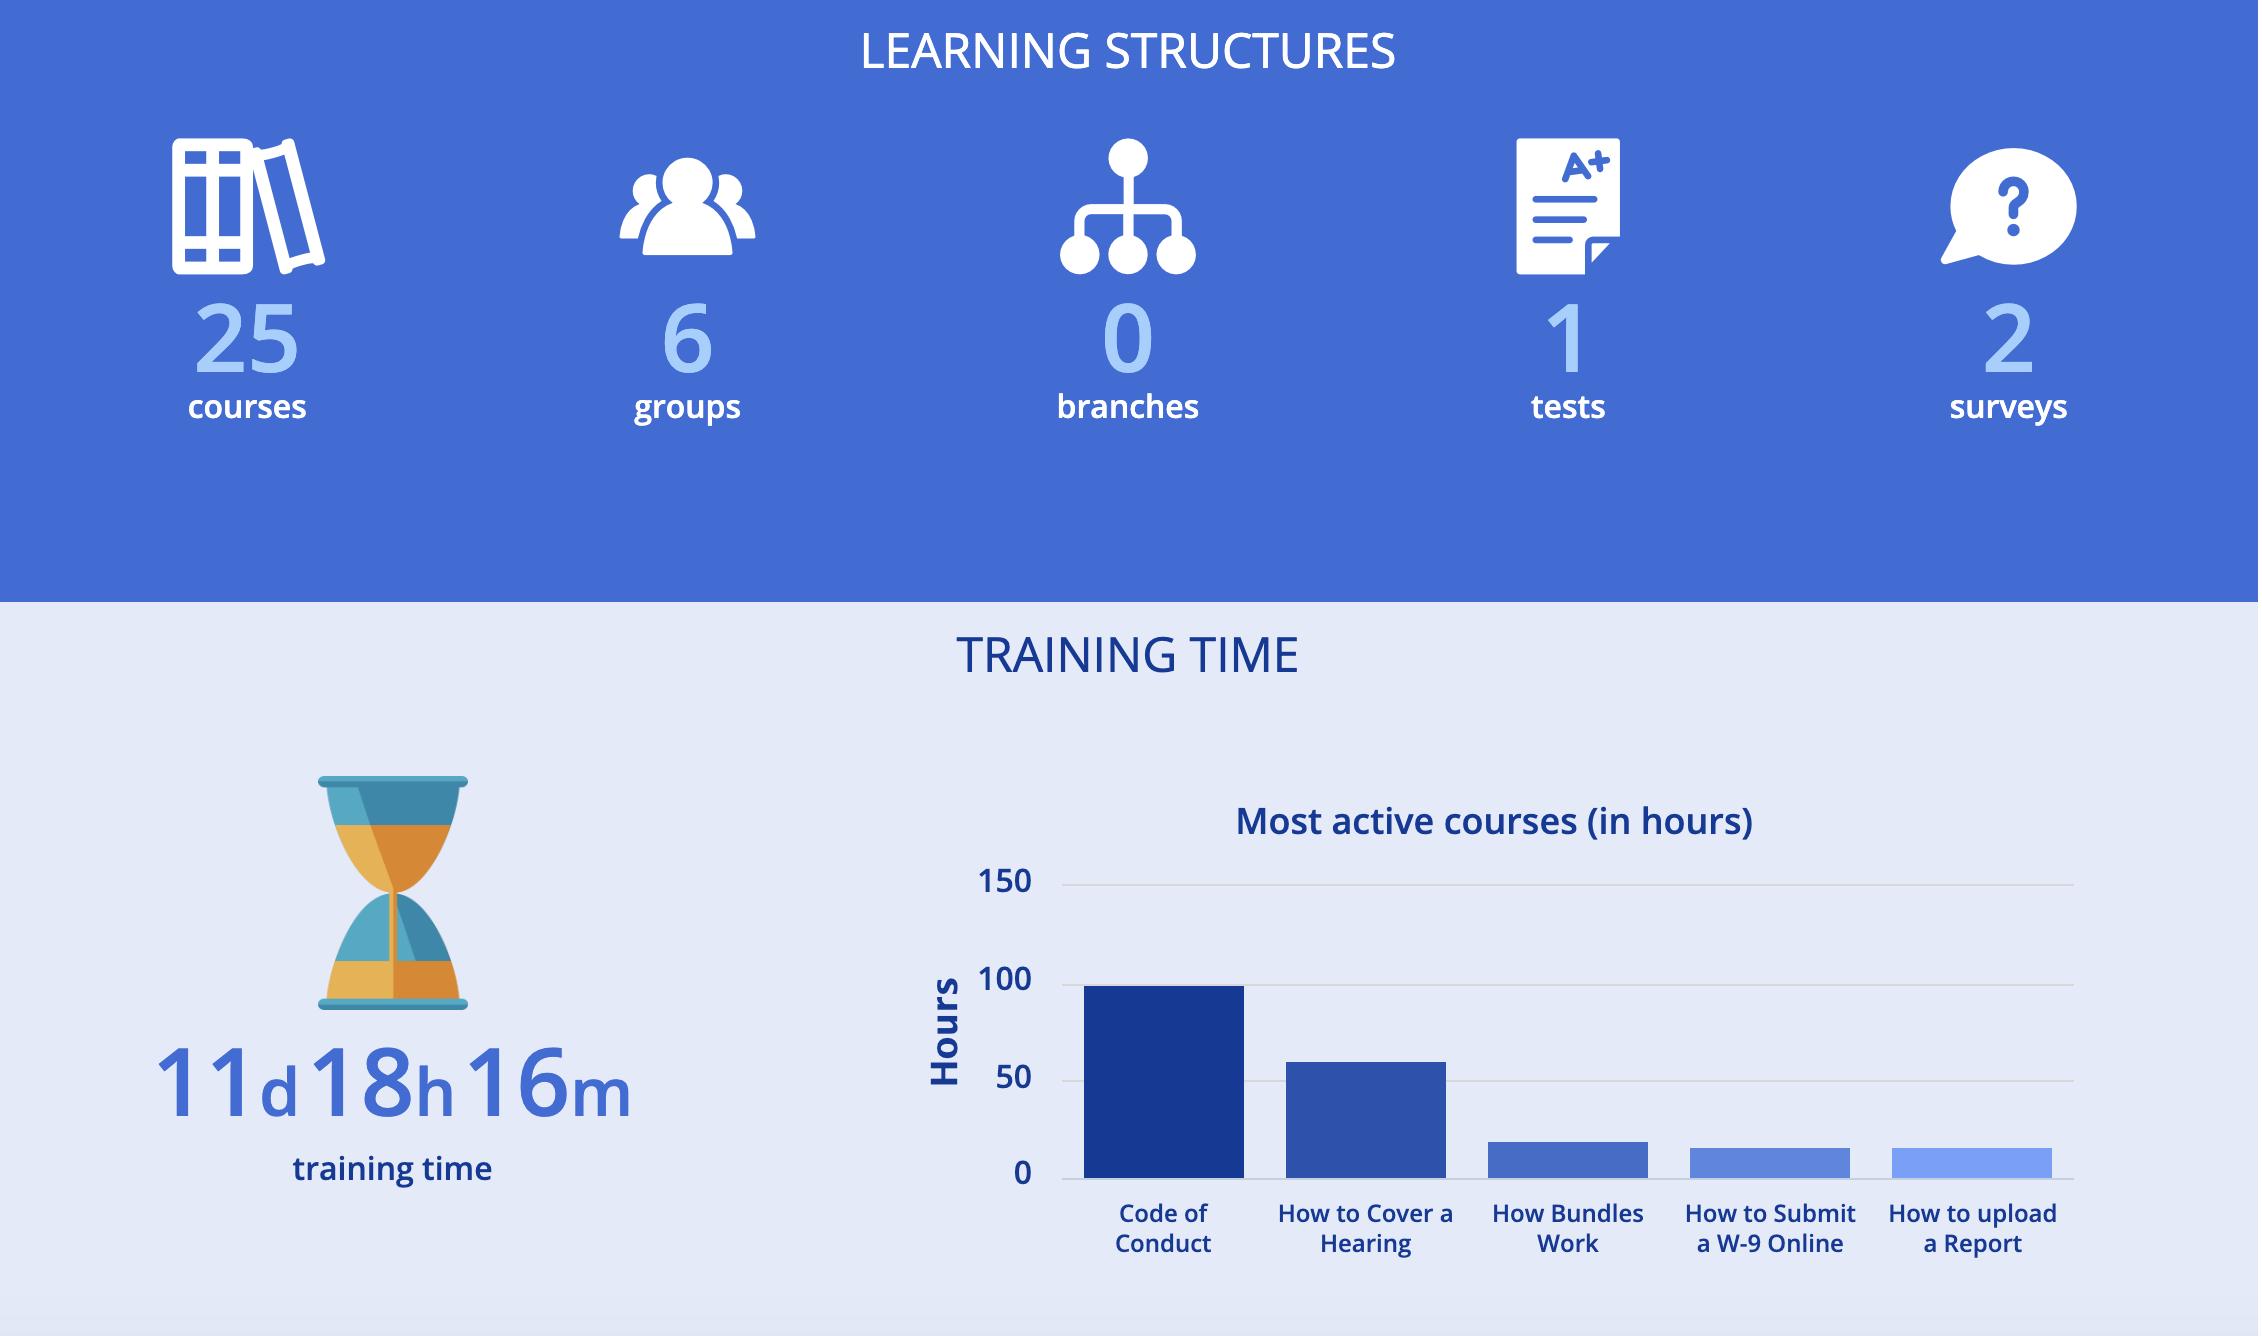 https://docketly.com/wp-content/uploads/2020/03/Learning-Management-System.png